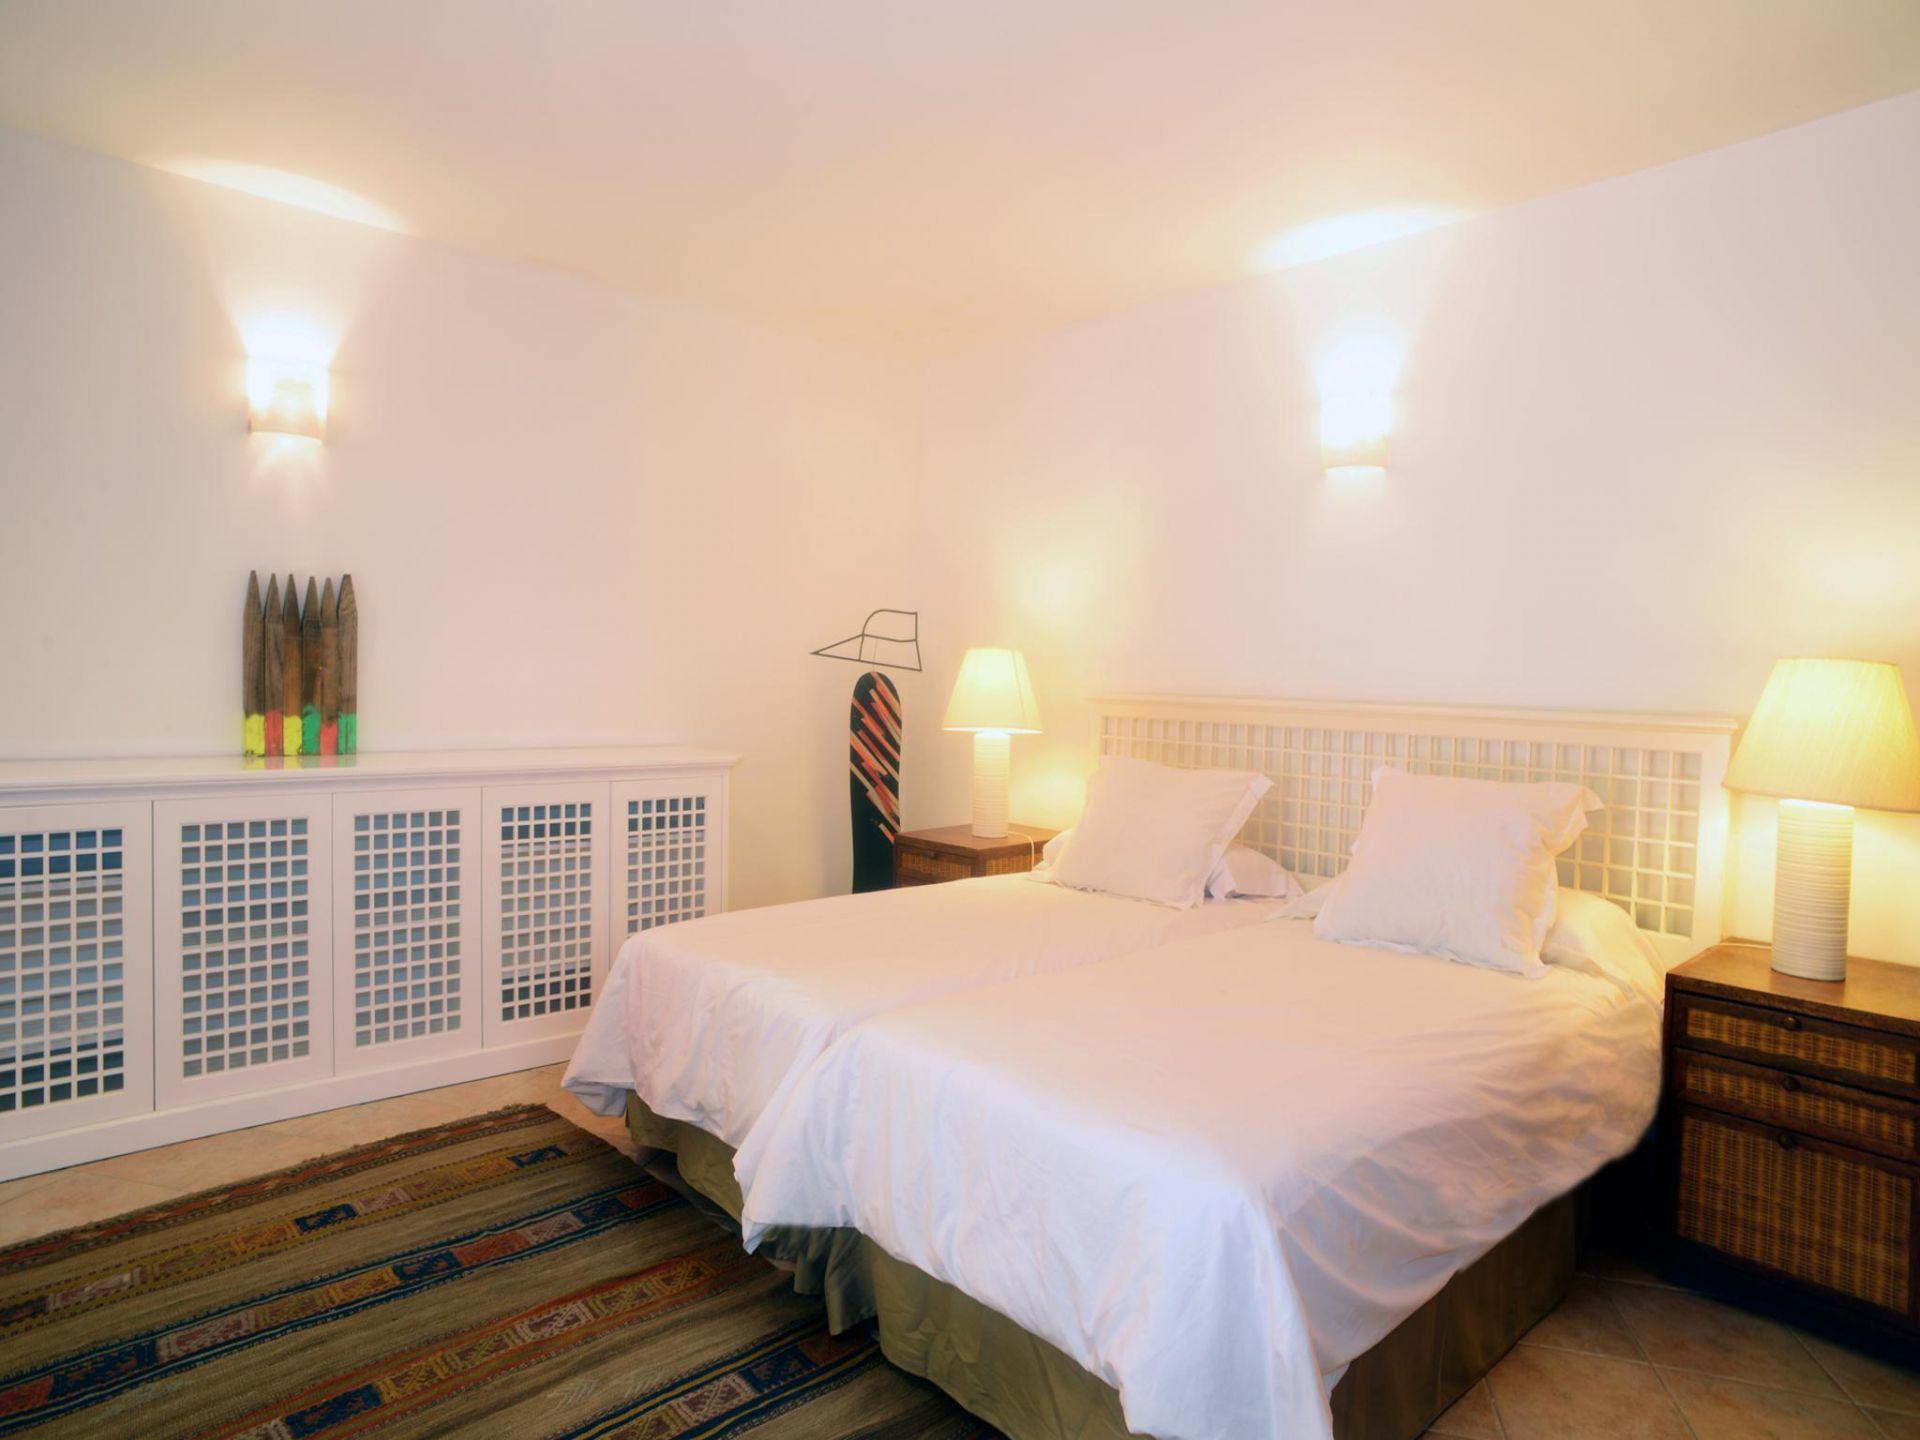 Holiday apartment Villa San Agustin 10 - Holiday Rental (854295), Maspalomas, Gran Canaria, Canary Islands, Spain, picture 26